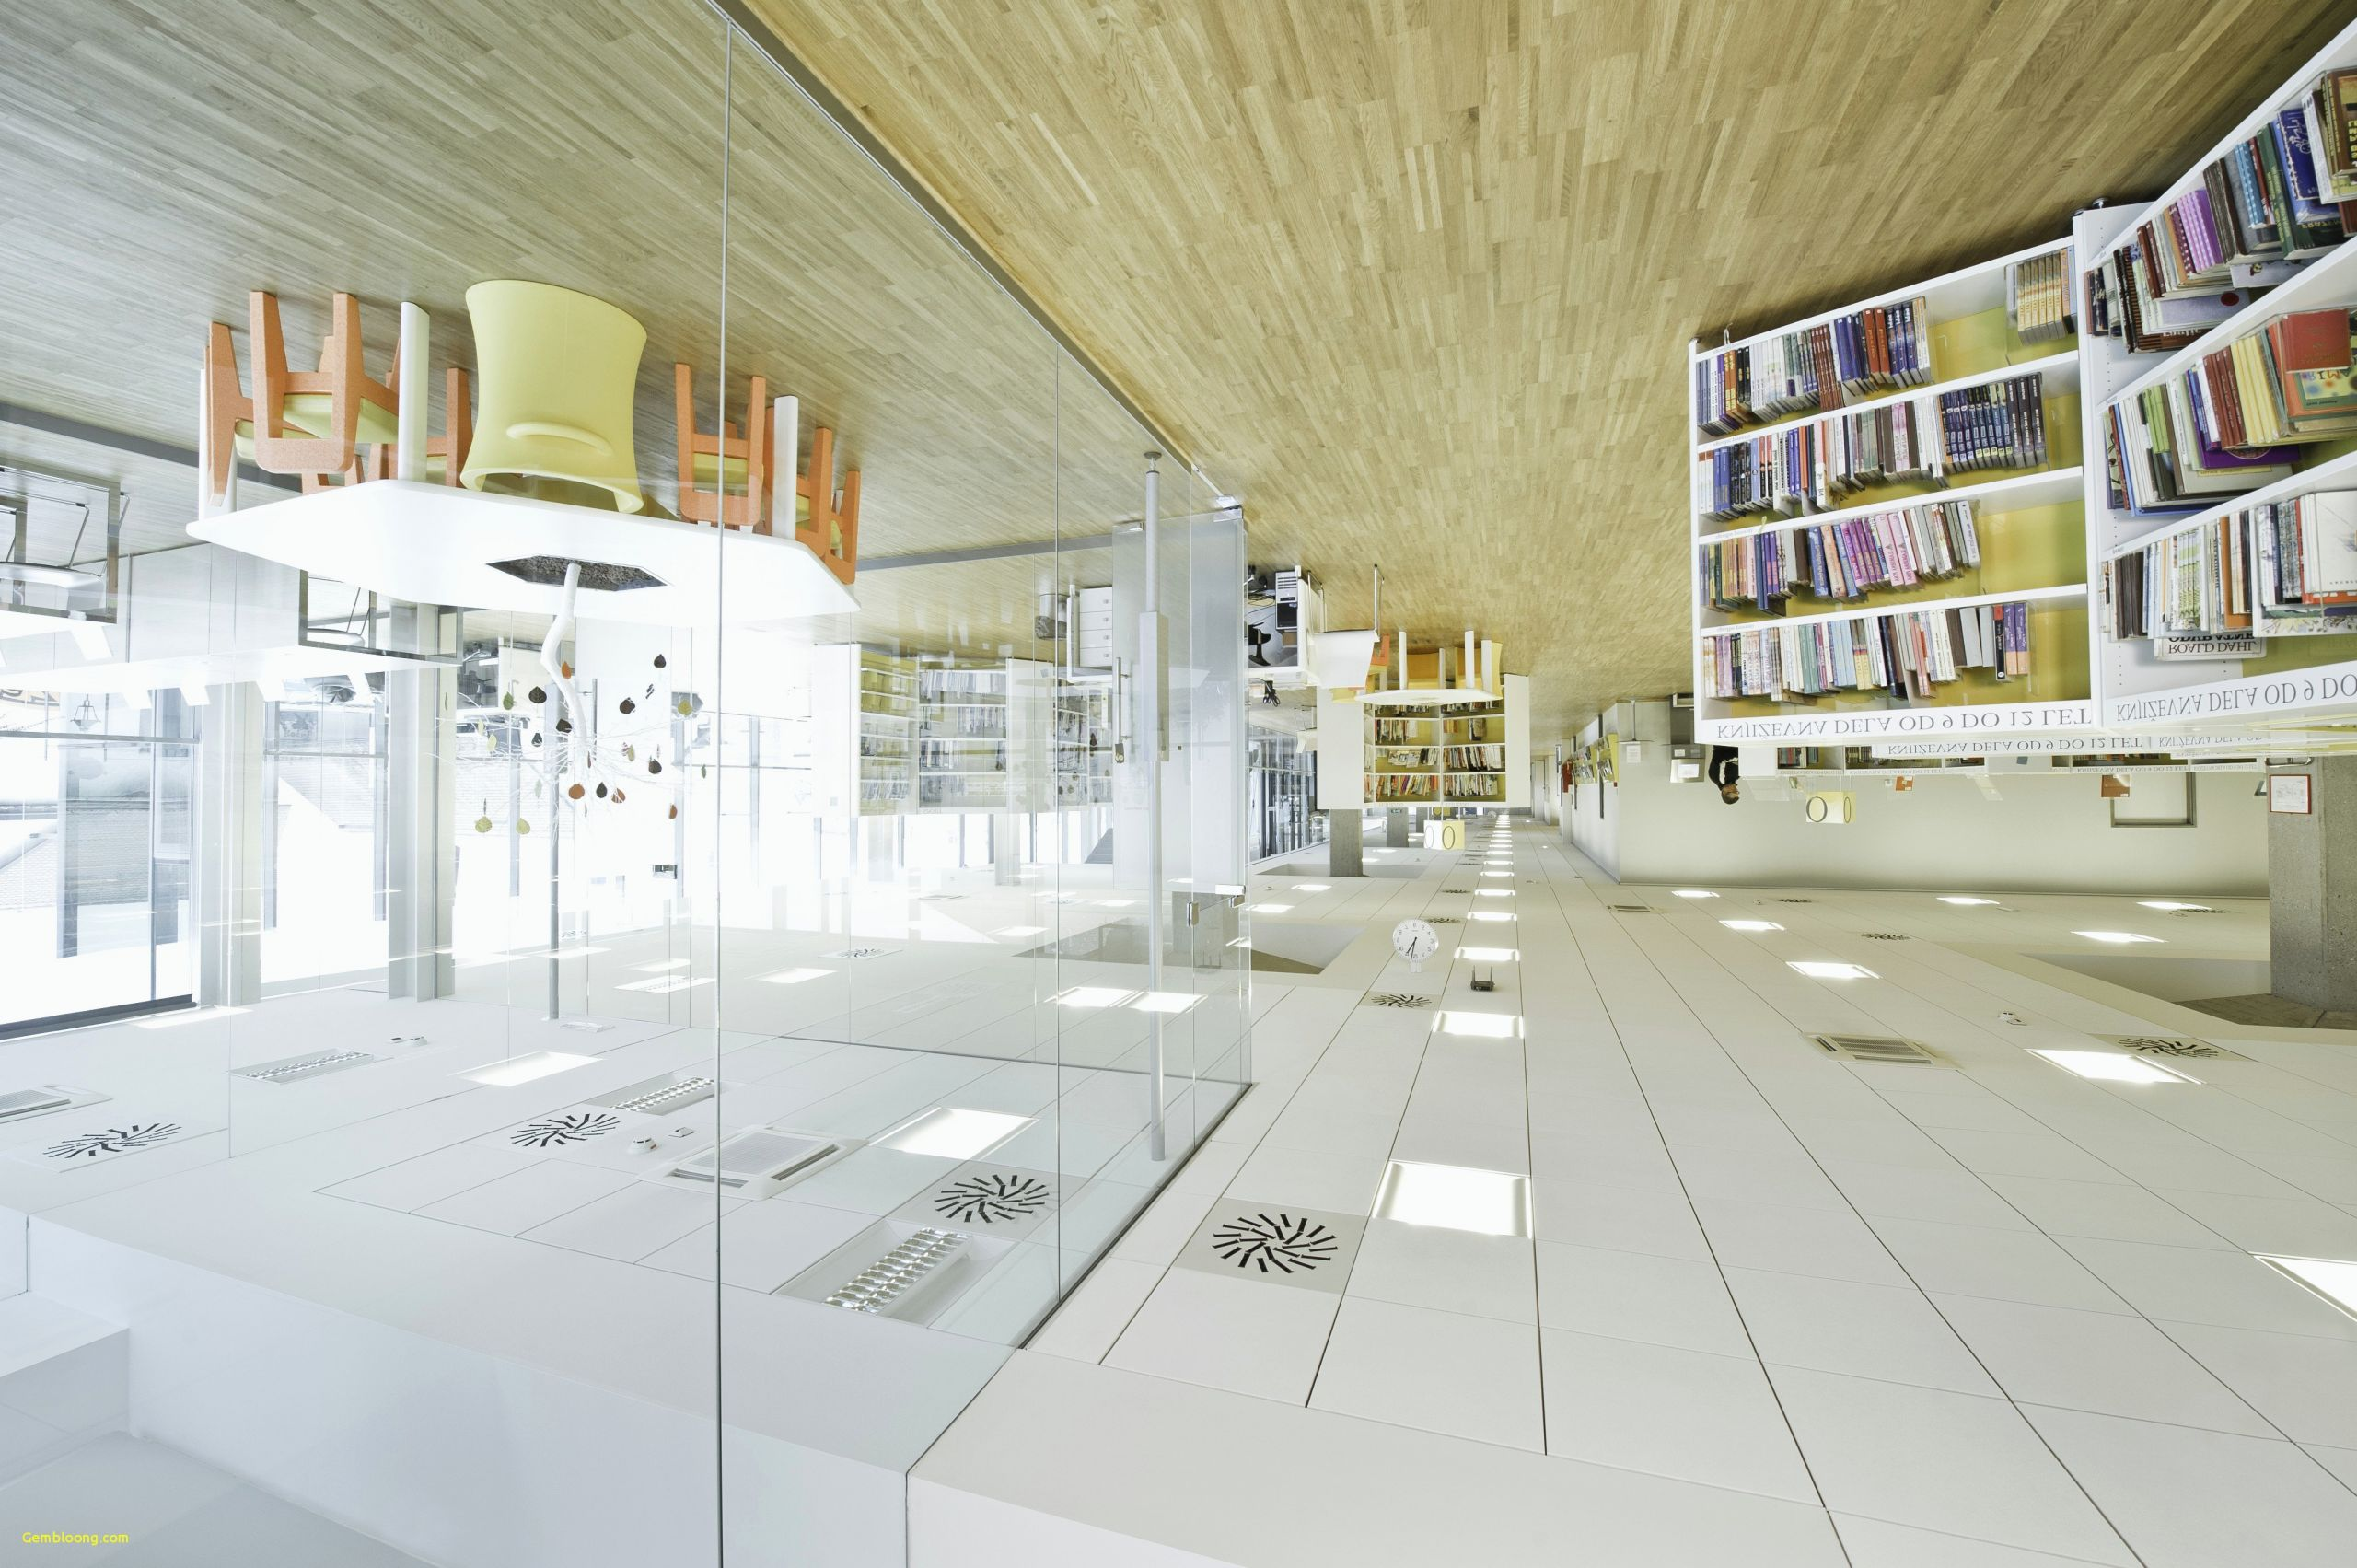 beton cire salon frais elegant beton cire pour terrasse exterieur smxs anime bel escalier of beton cire salon